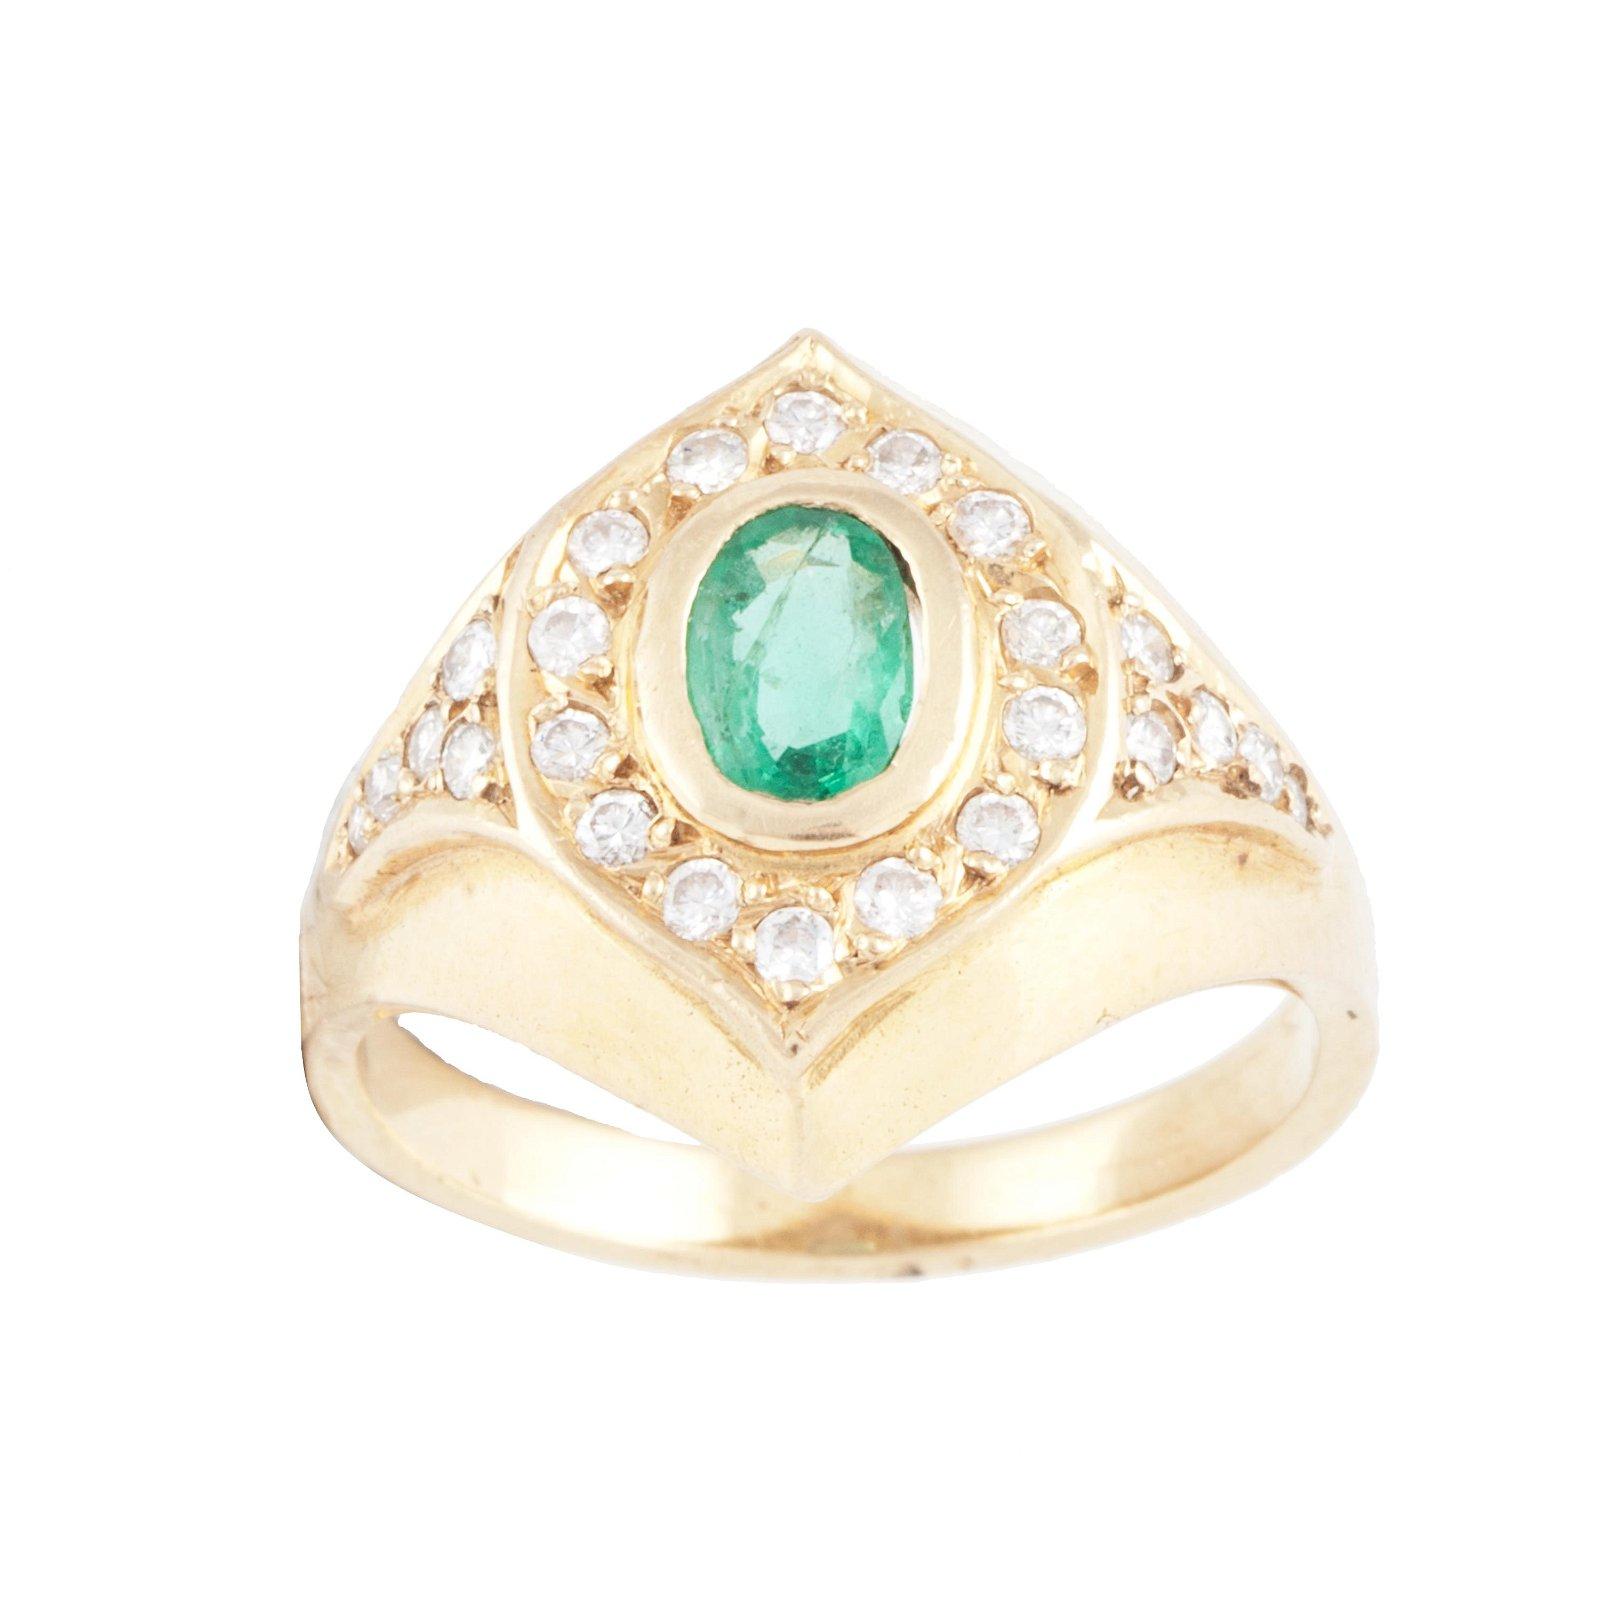 DIAMOND AND EMERALD RING.